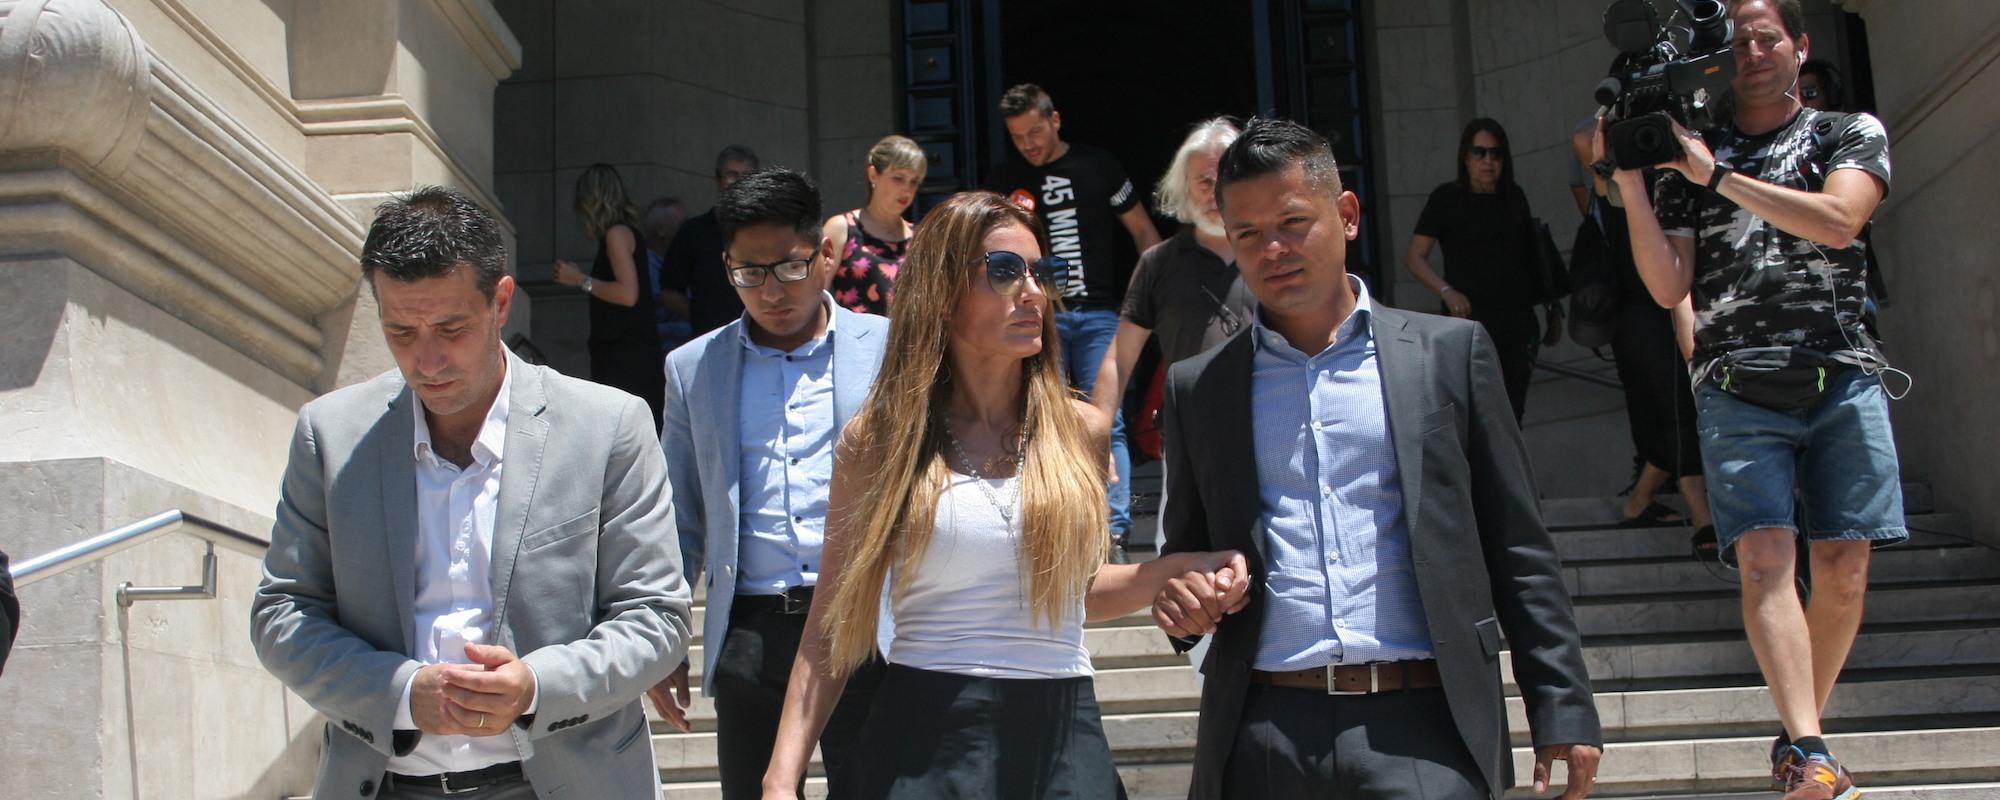 Natacha Jaitt Leaving The Courthouse